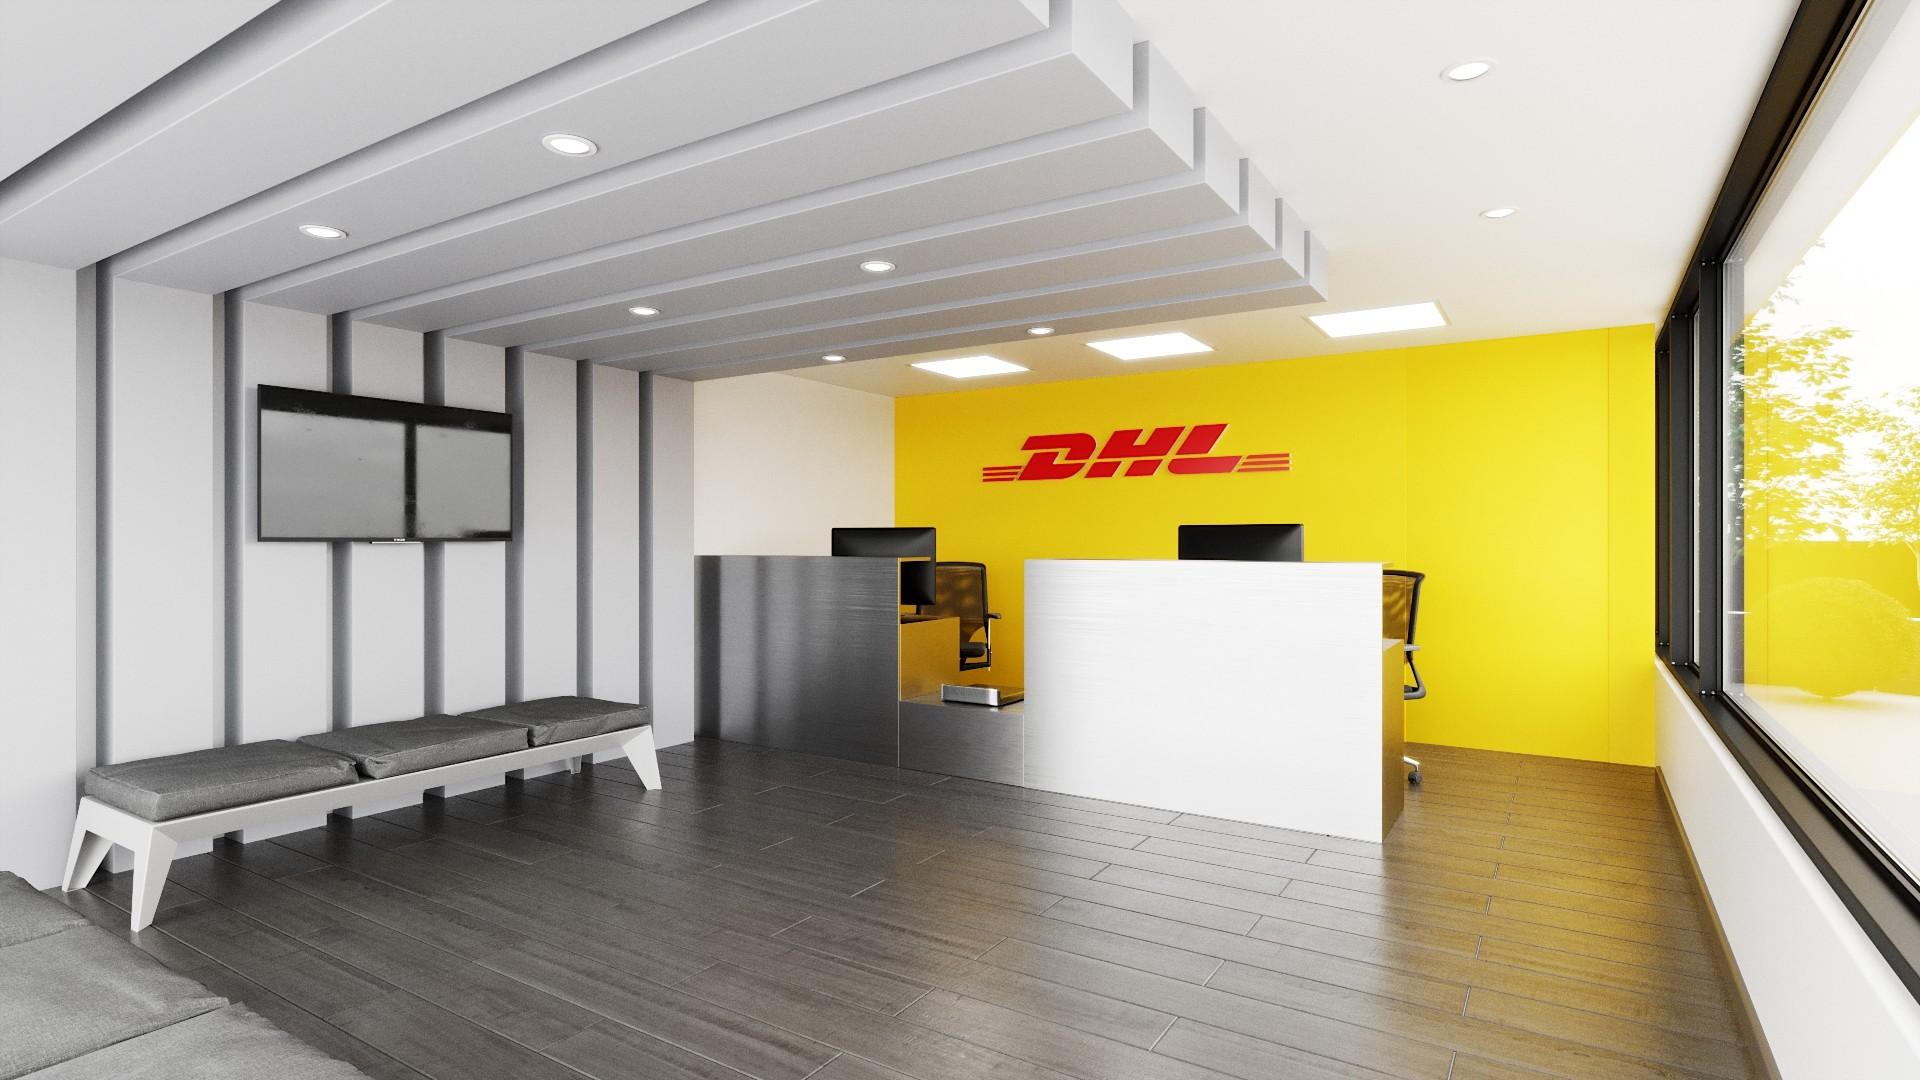 DHL office